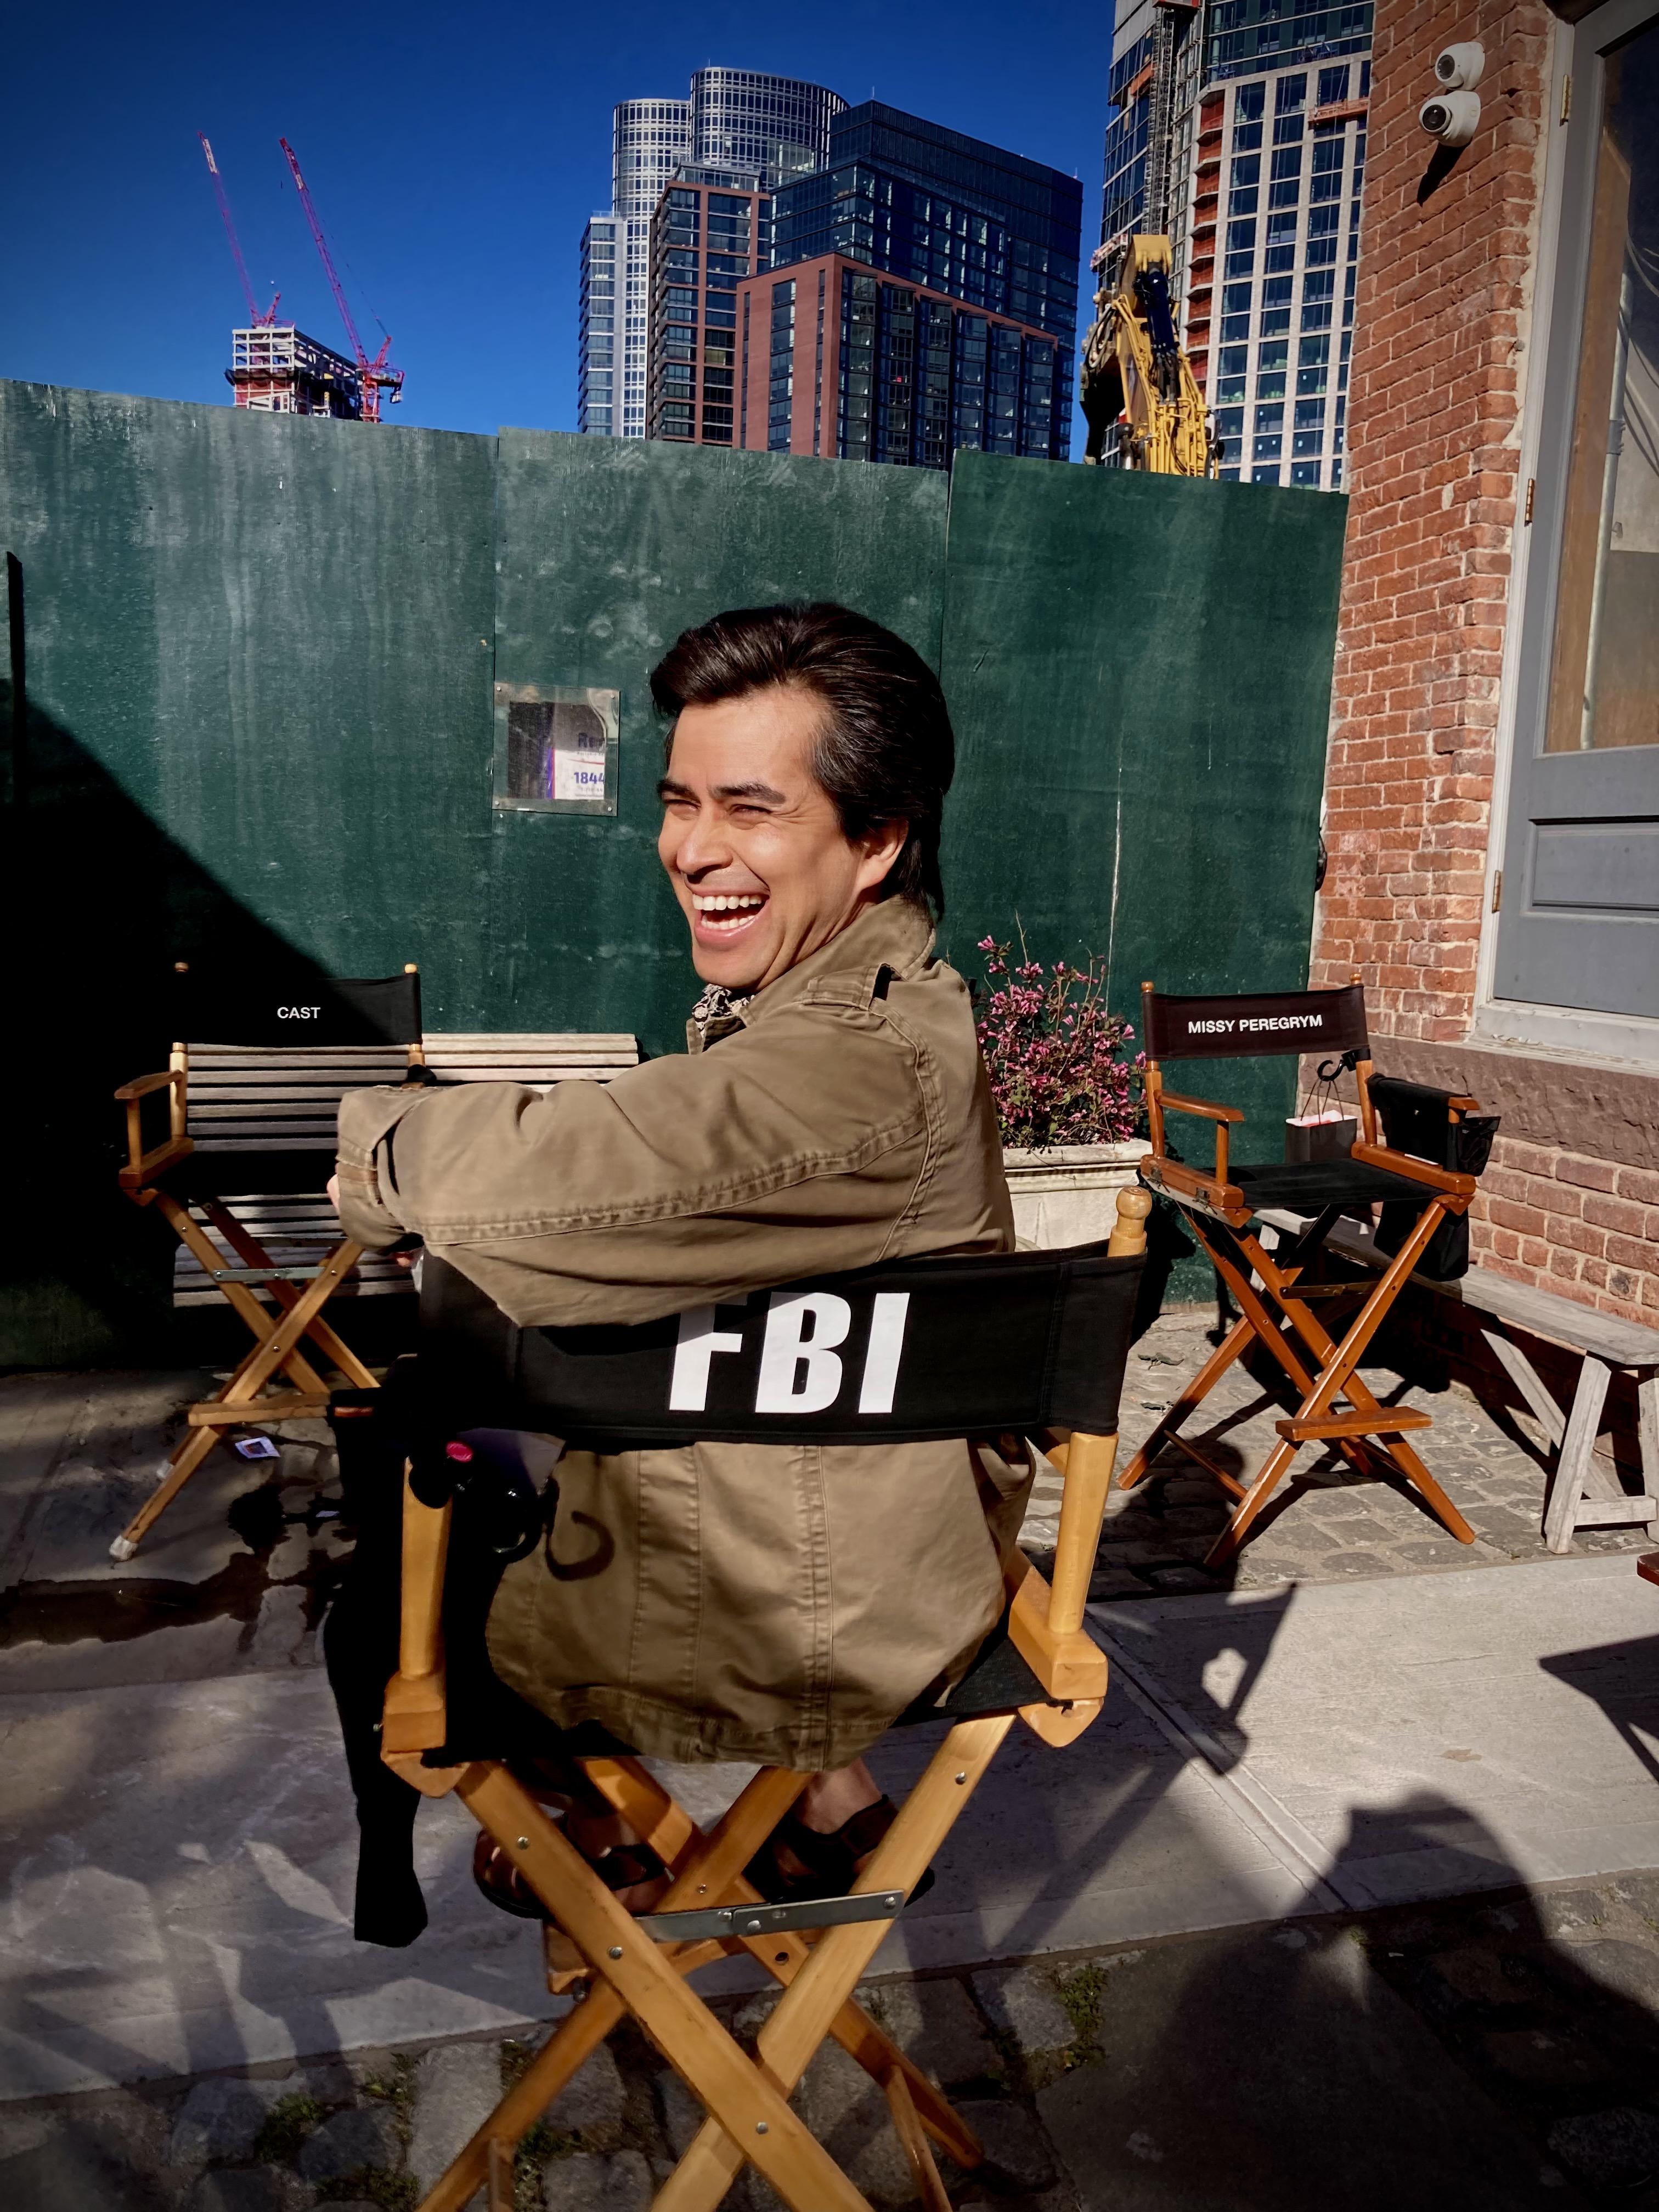 Alberto Bonilla on the set of FBI